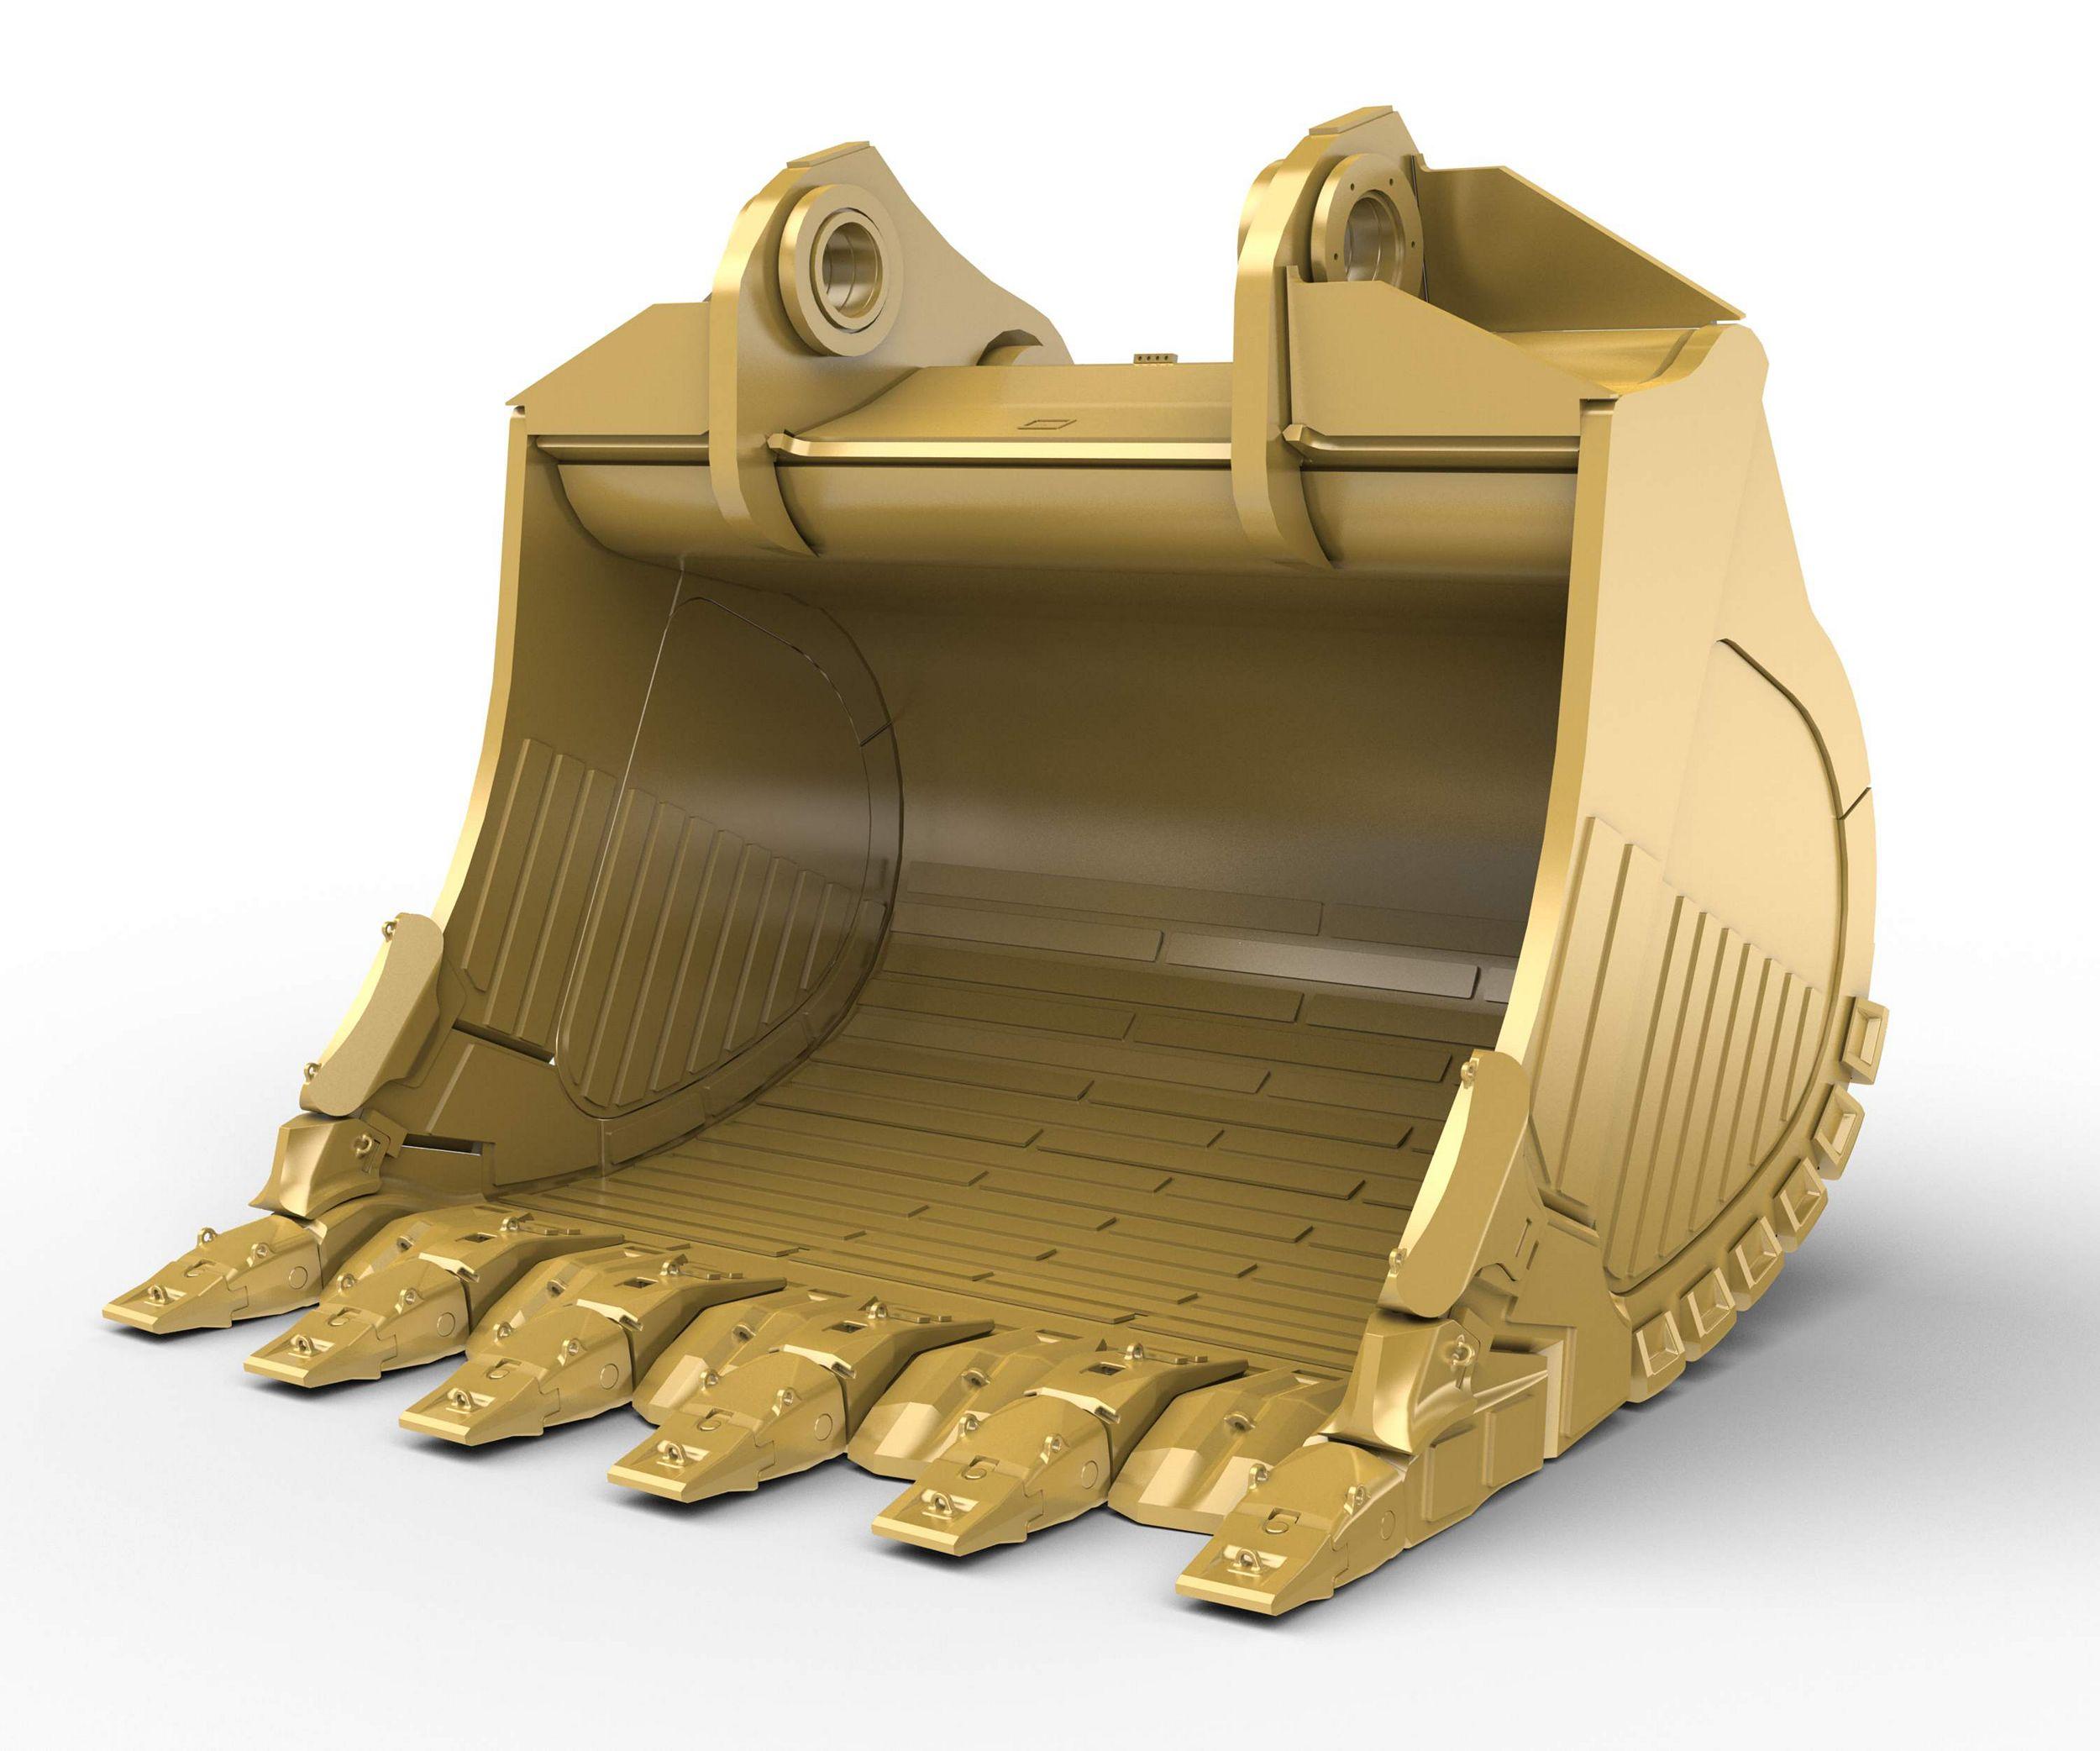 25m³ (32.7yd³) Heavy Rock bucket for the 6050 Hyd Mining Shovel